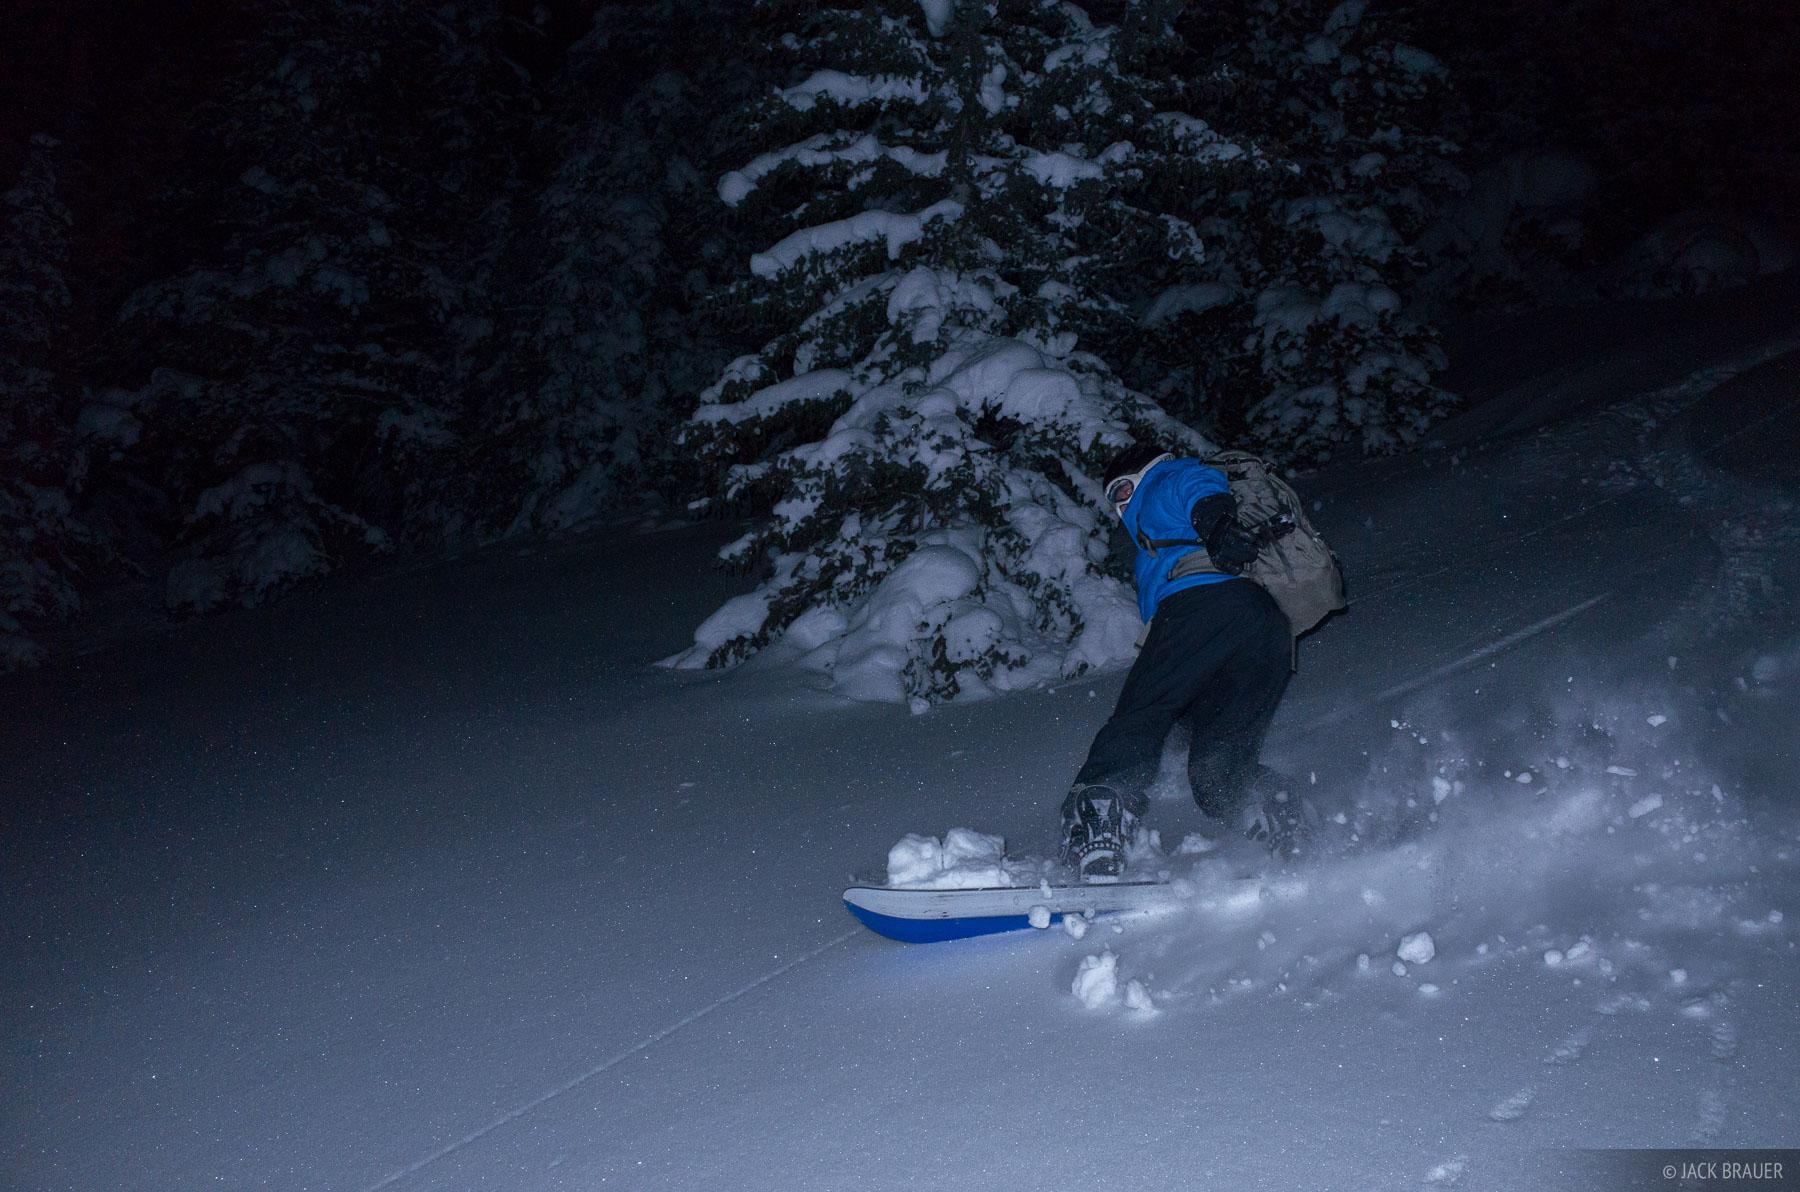 Snowboarding powder under a full moon - January.